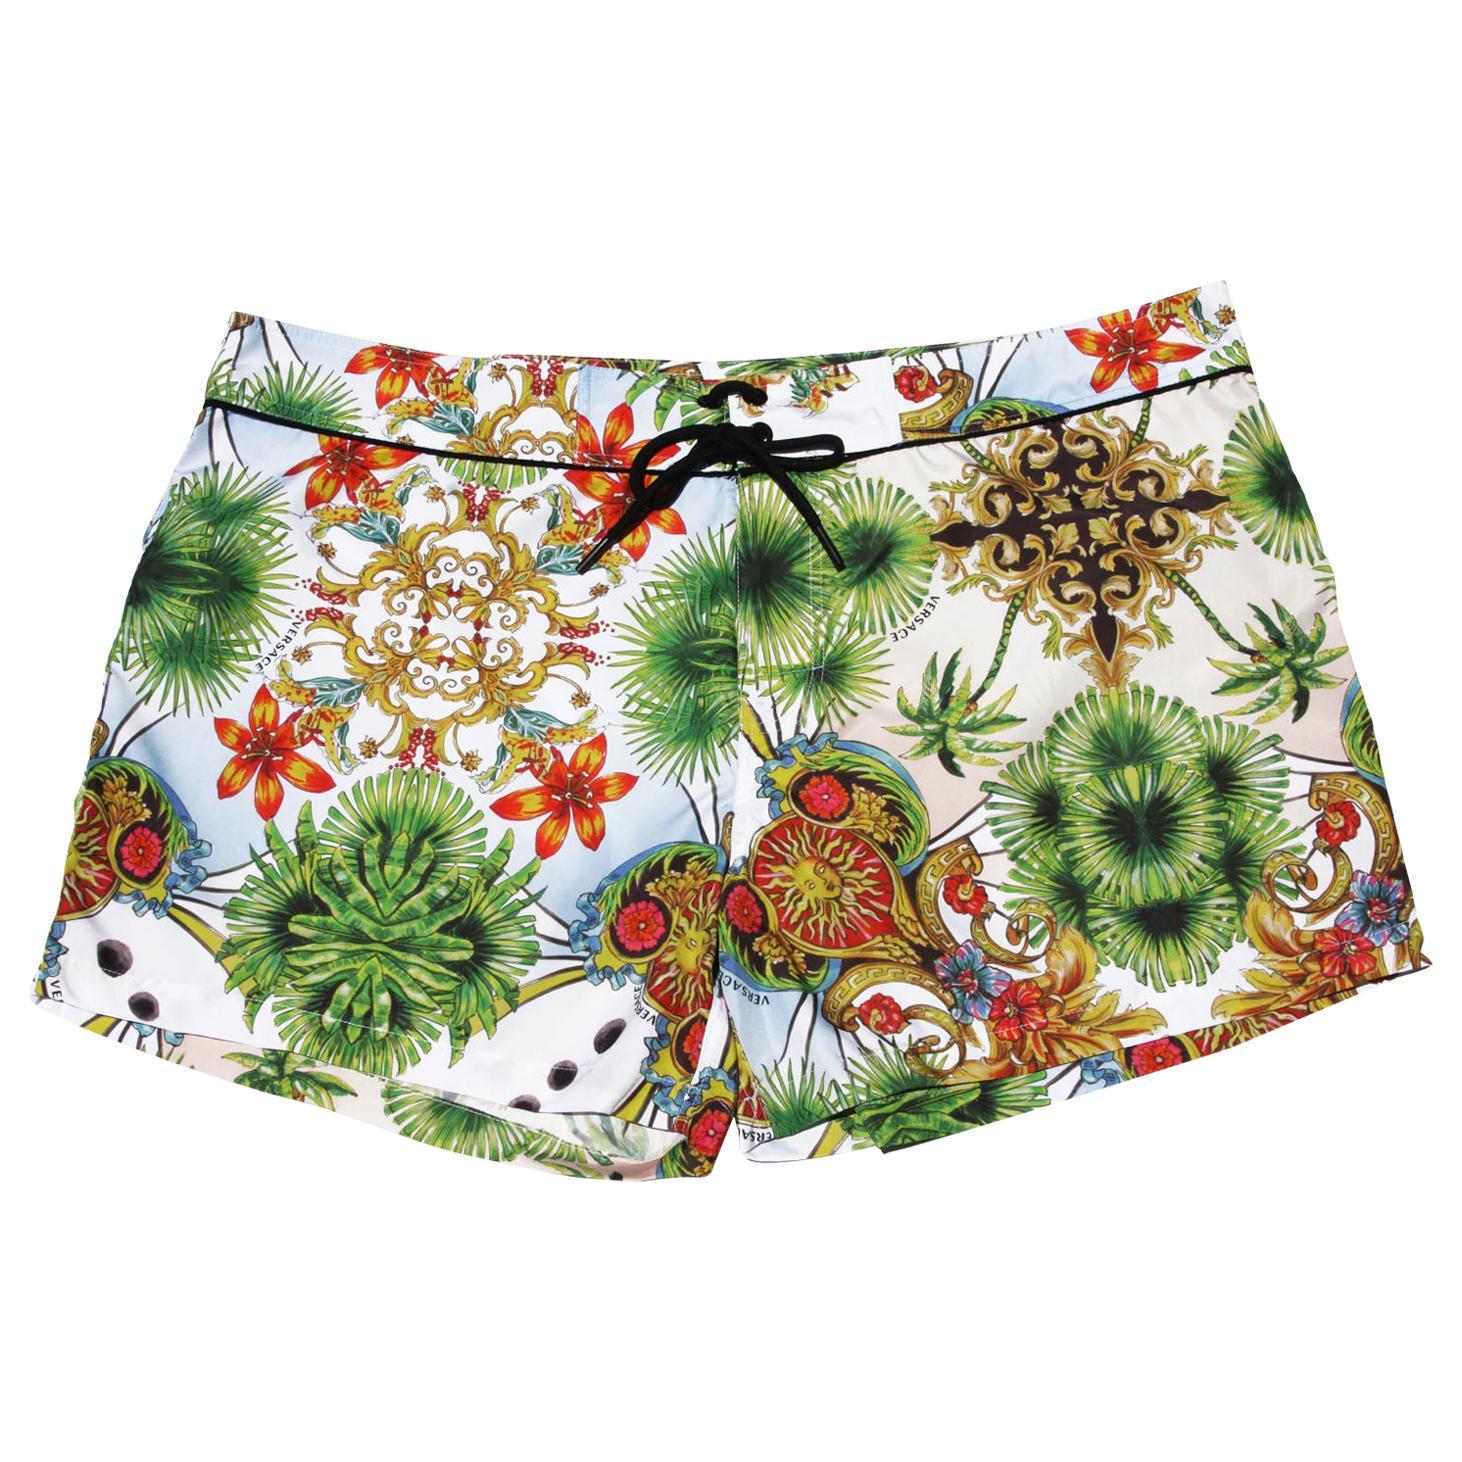 "New Versace Men's *Miami* Swimwear Beachwear Shorts size 7 - waist 38"""